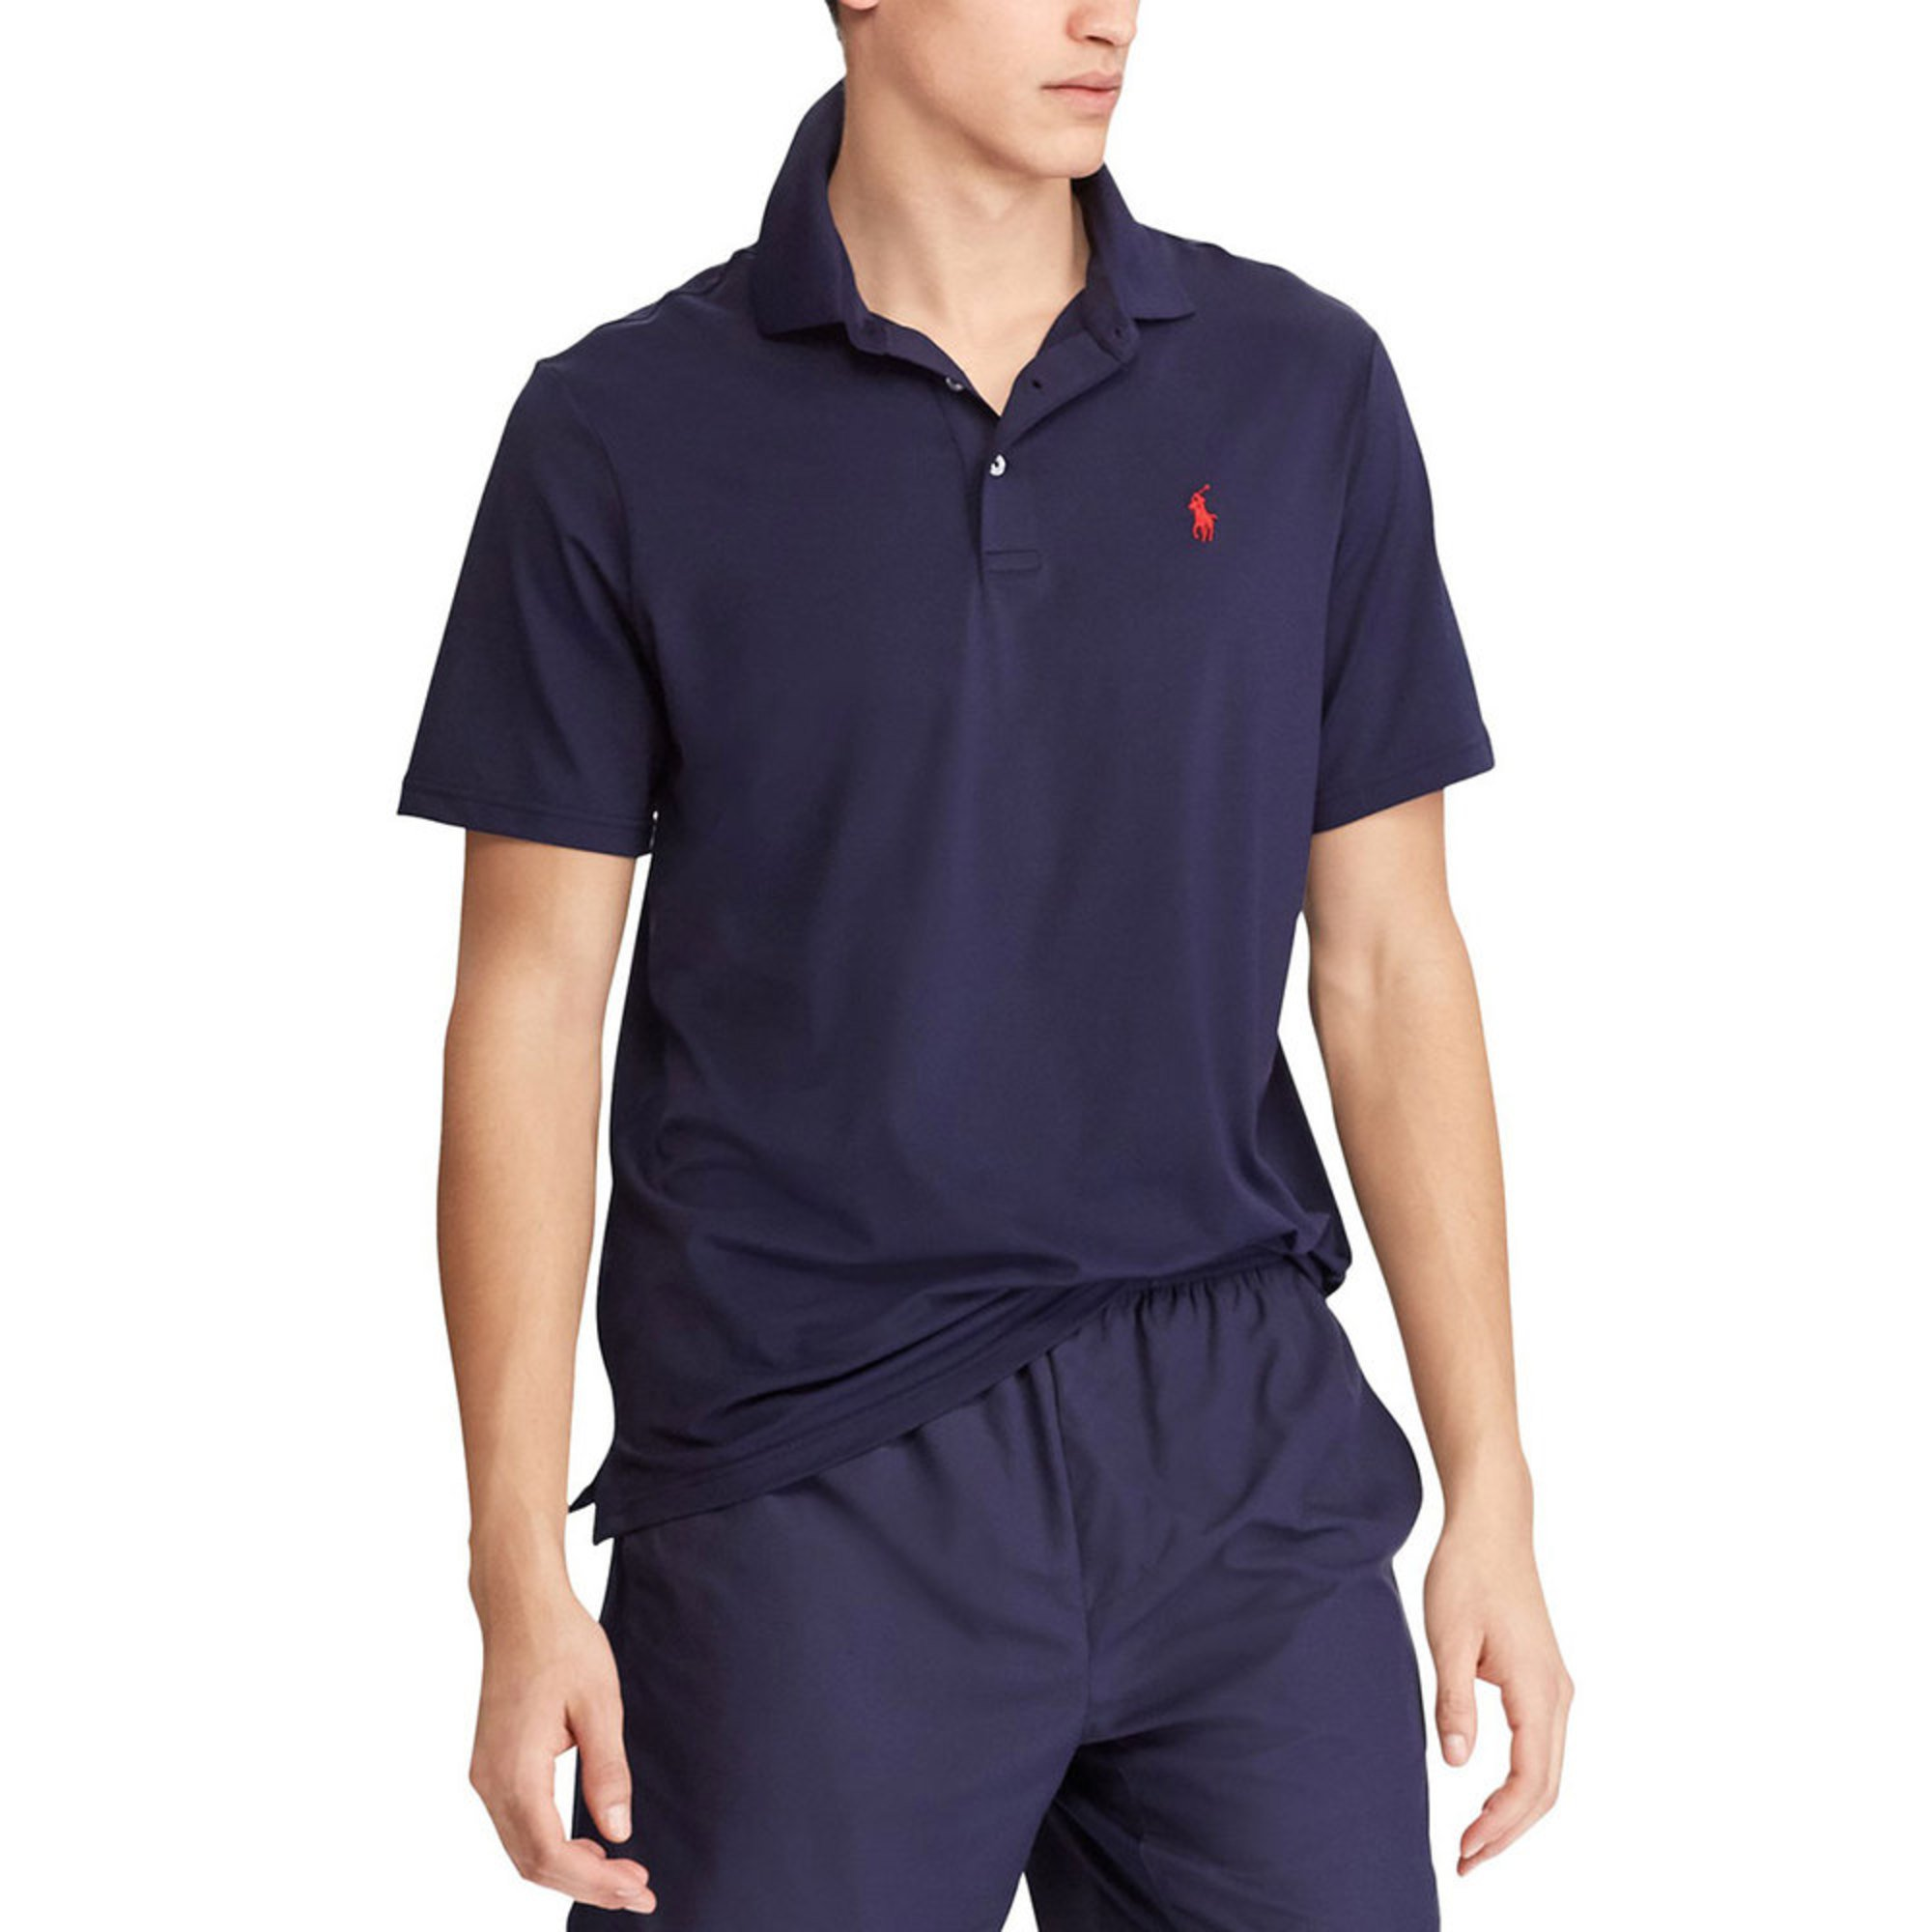 Polo Ralph Lauren Mens Short Sleeve Performance Airflow Polo